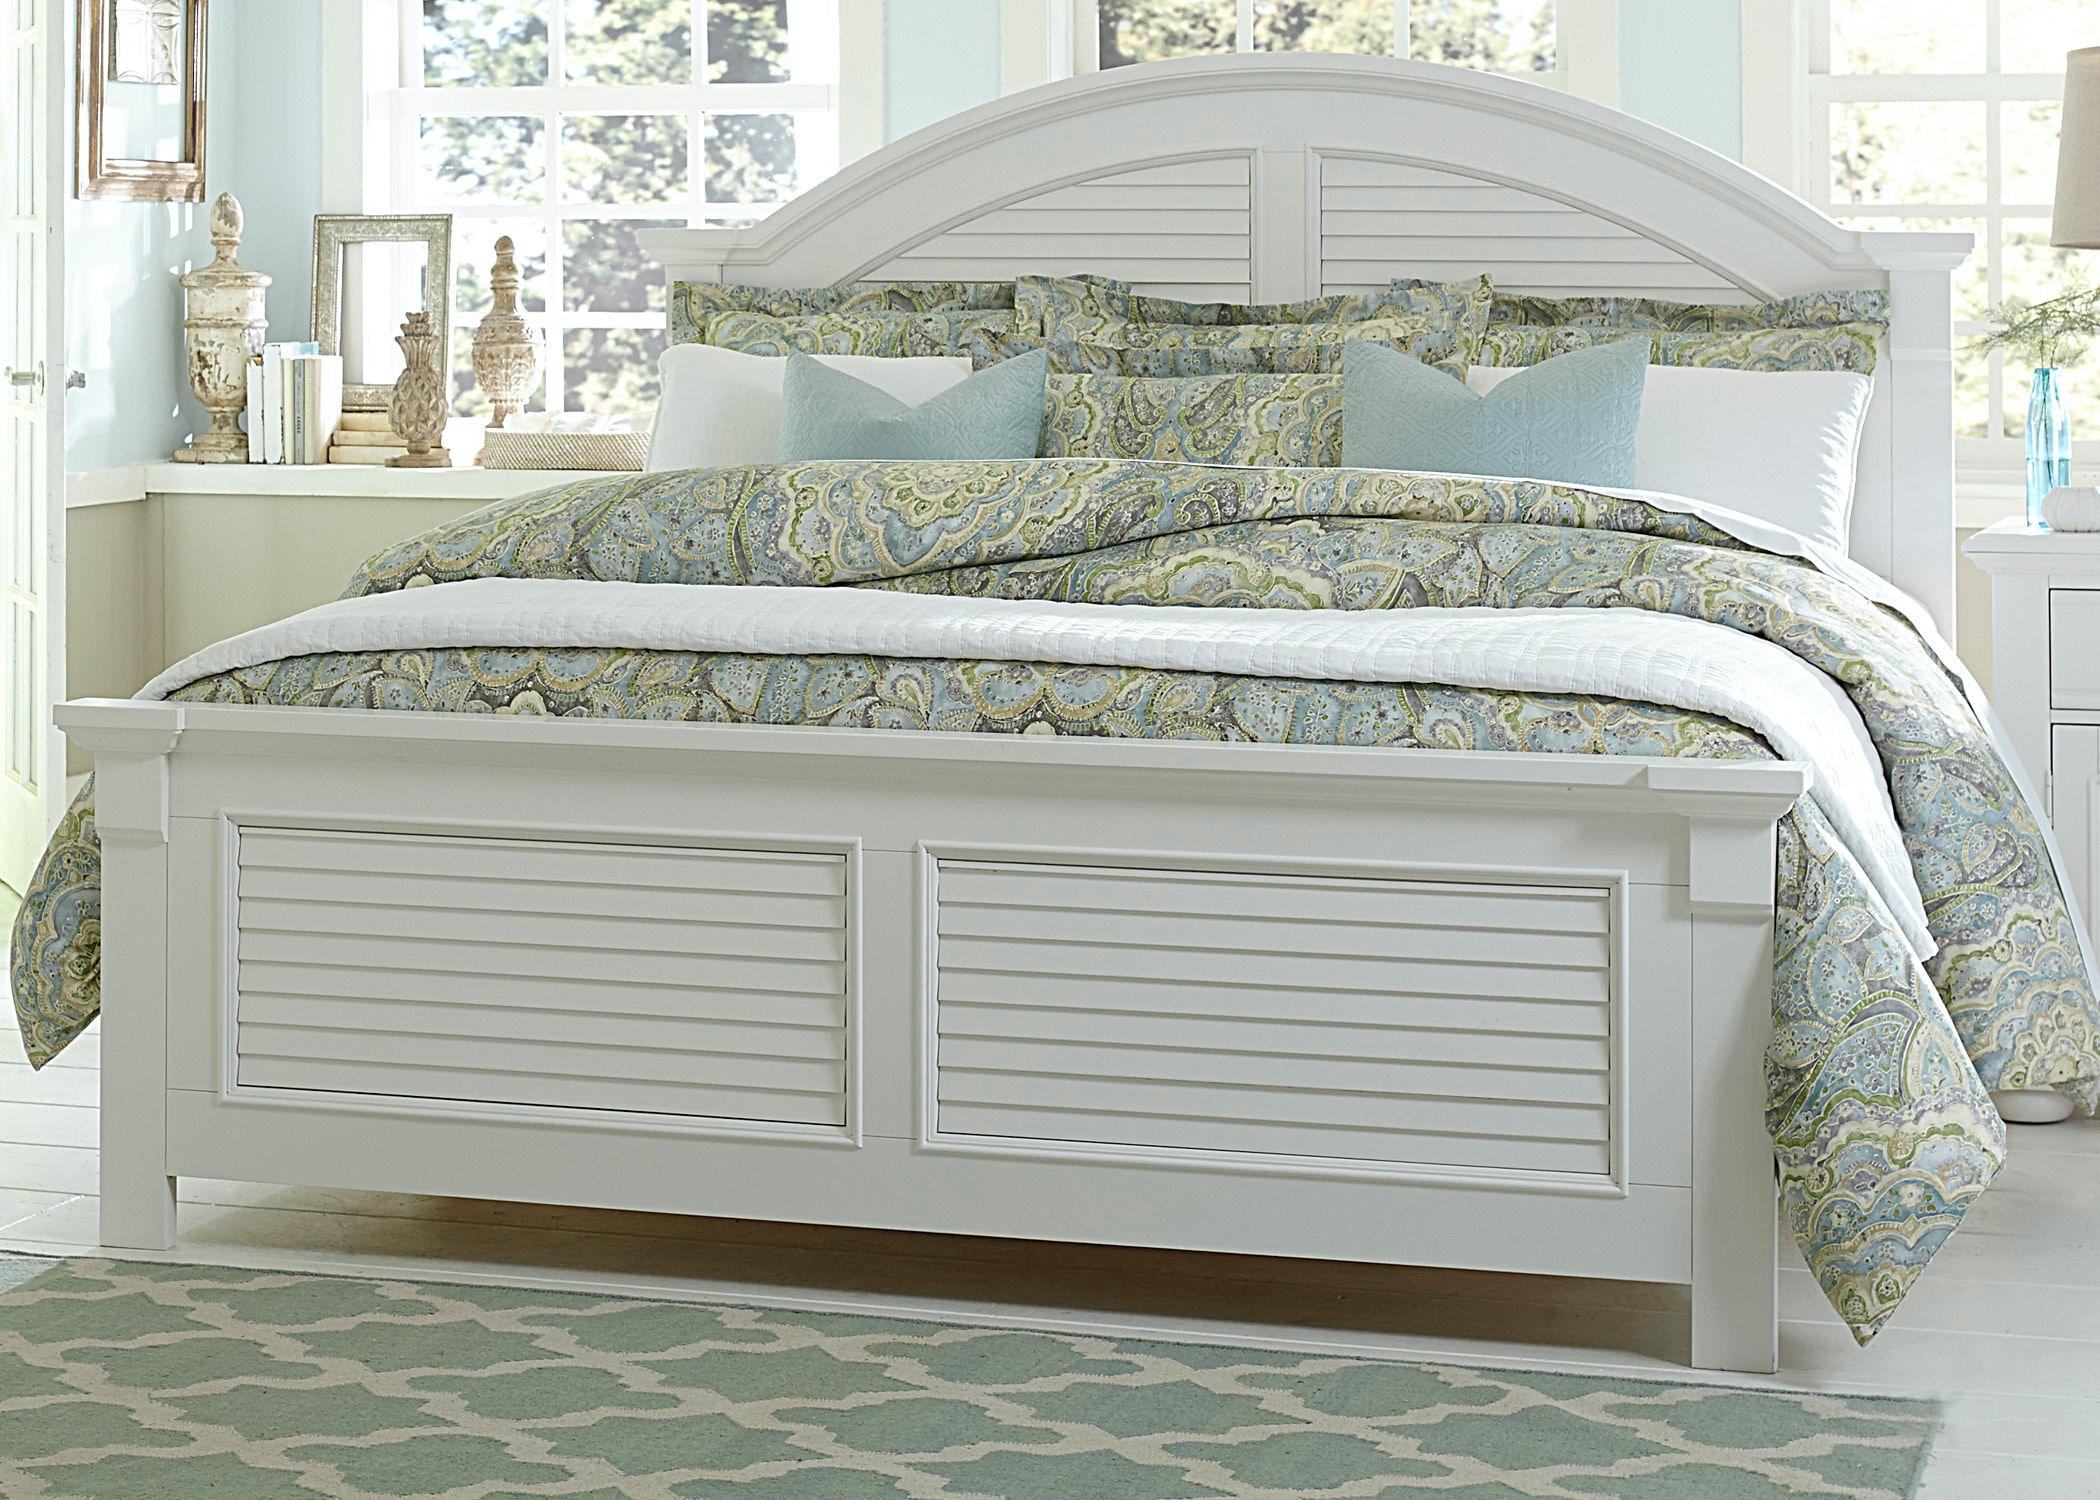 Liberty Furniture King Panel Footboard 607 BR16